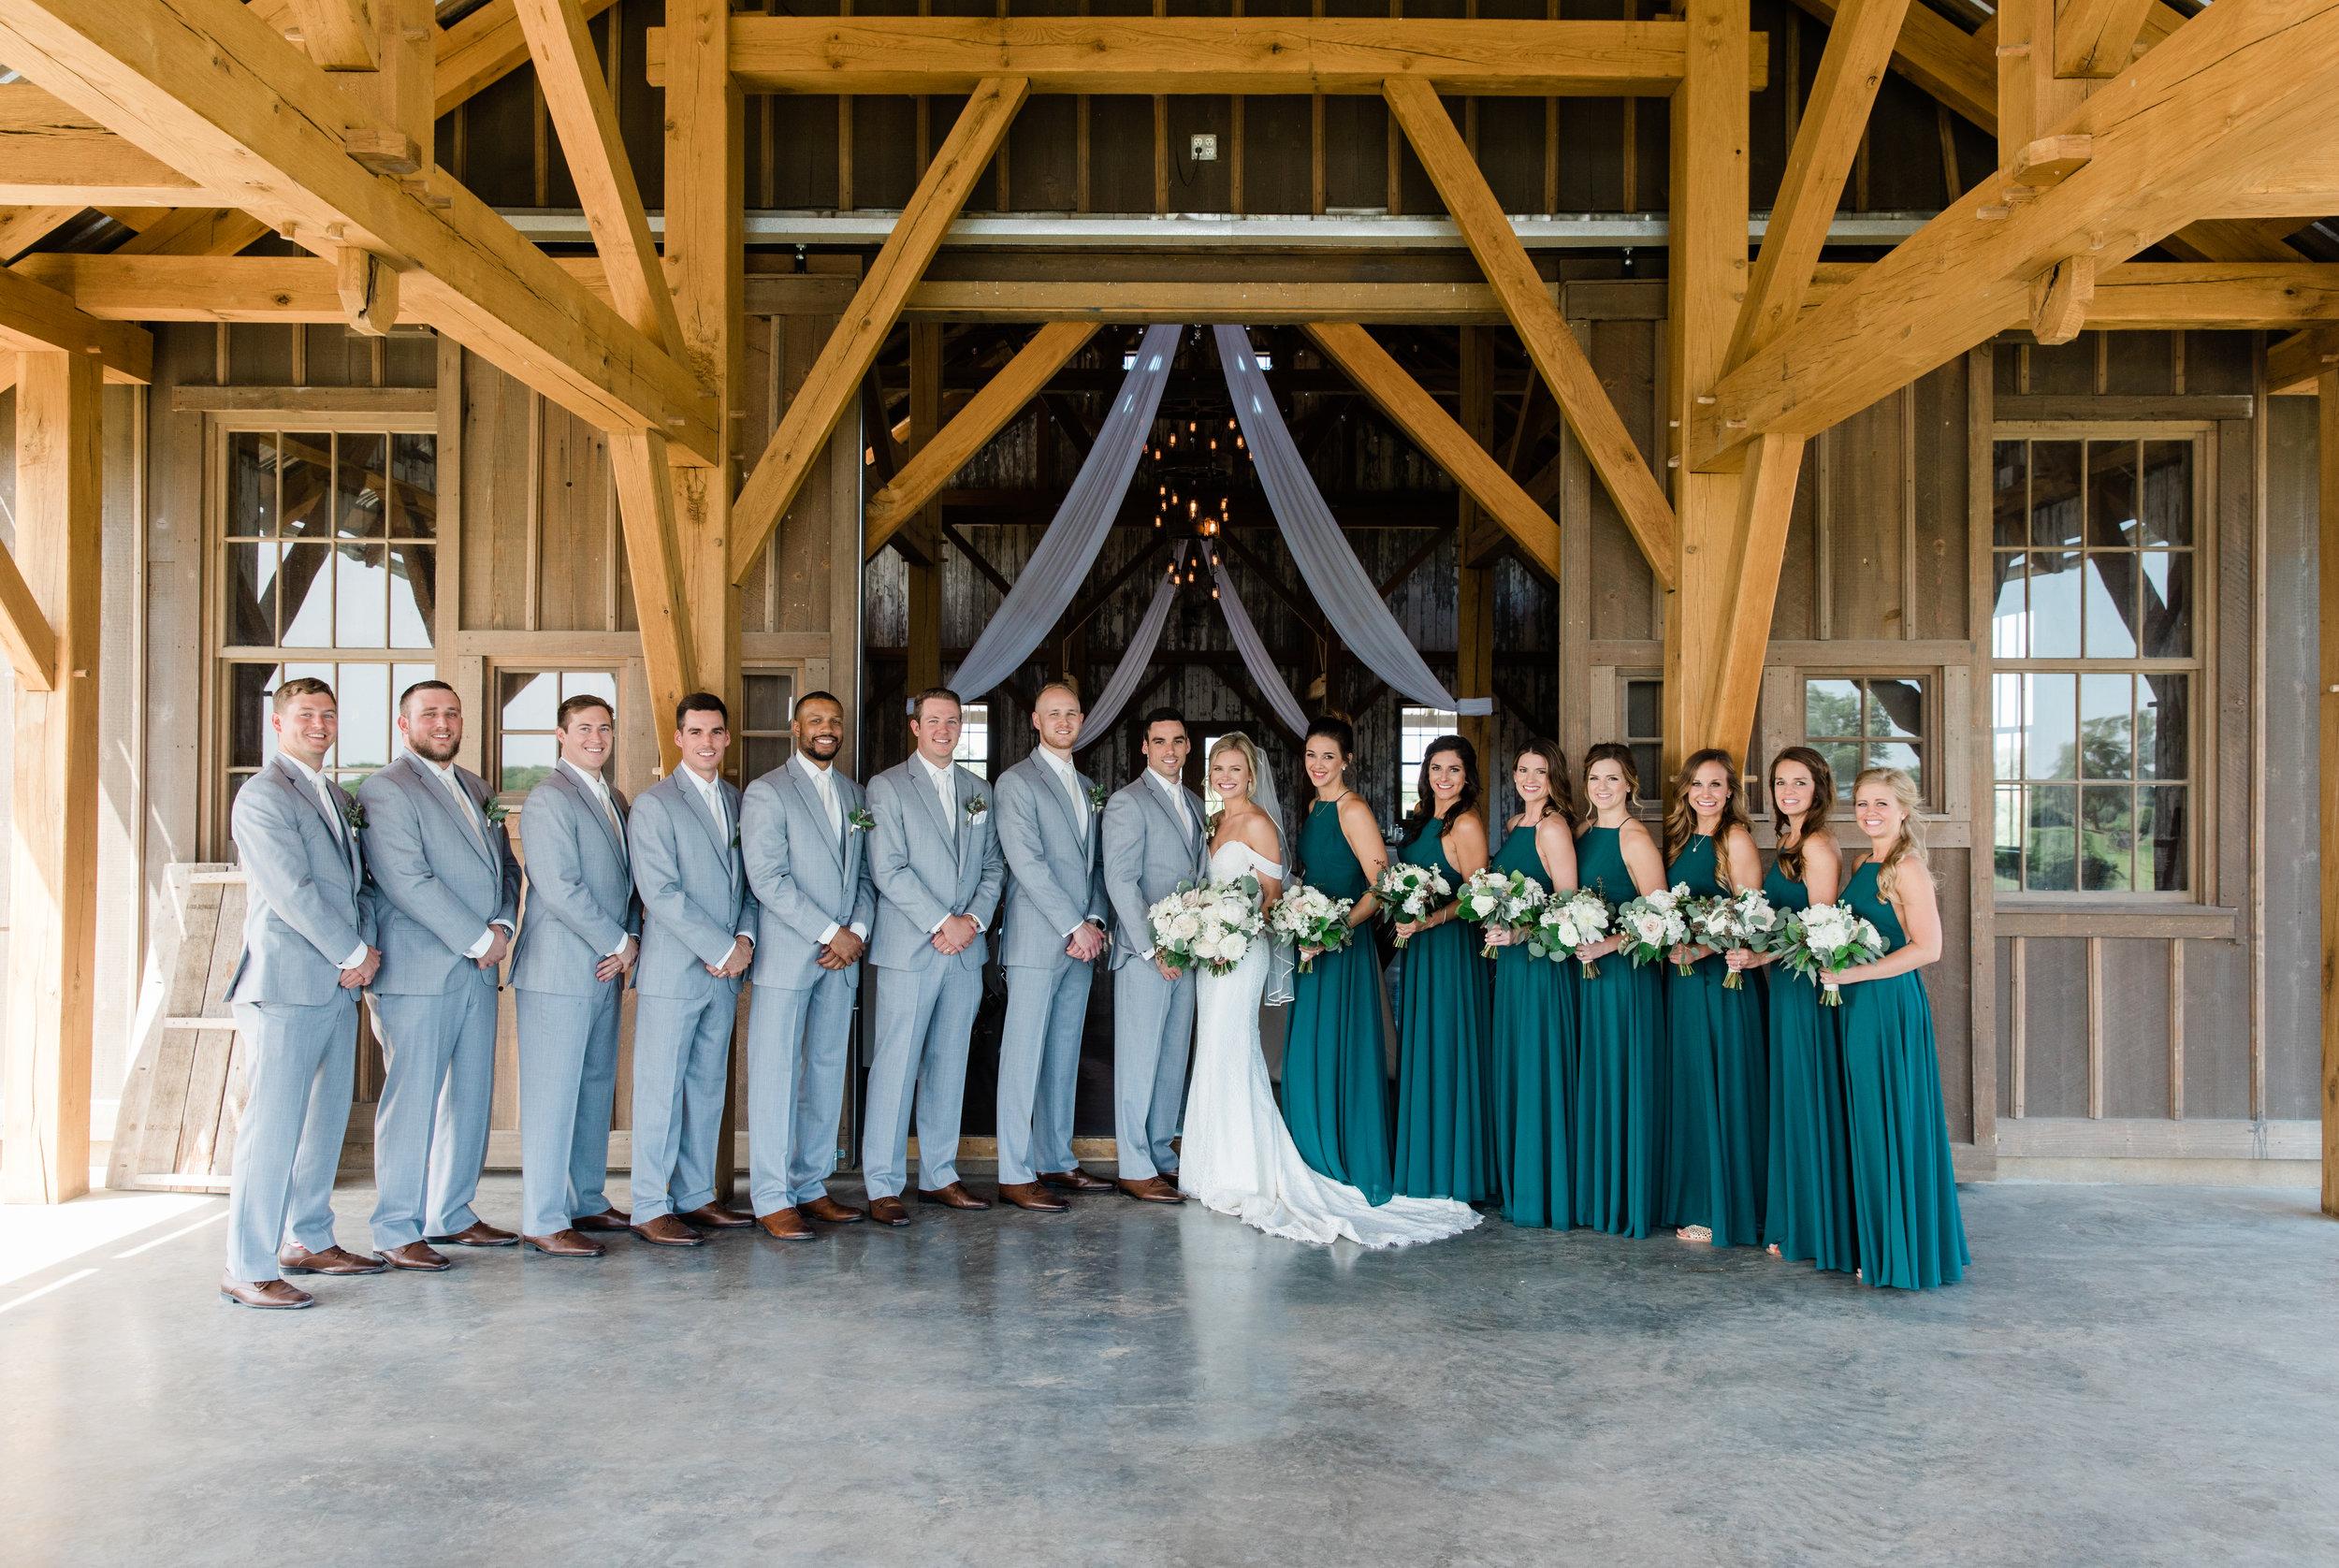 RHODES WEDDING - MARISSA CRIBBS PHOTOGRAPHY-414.jpg